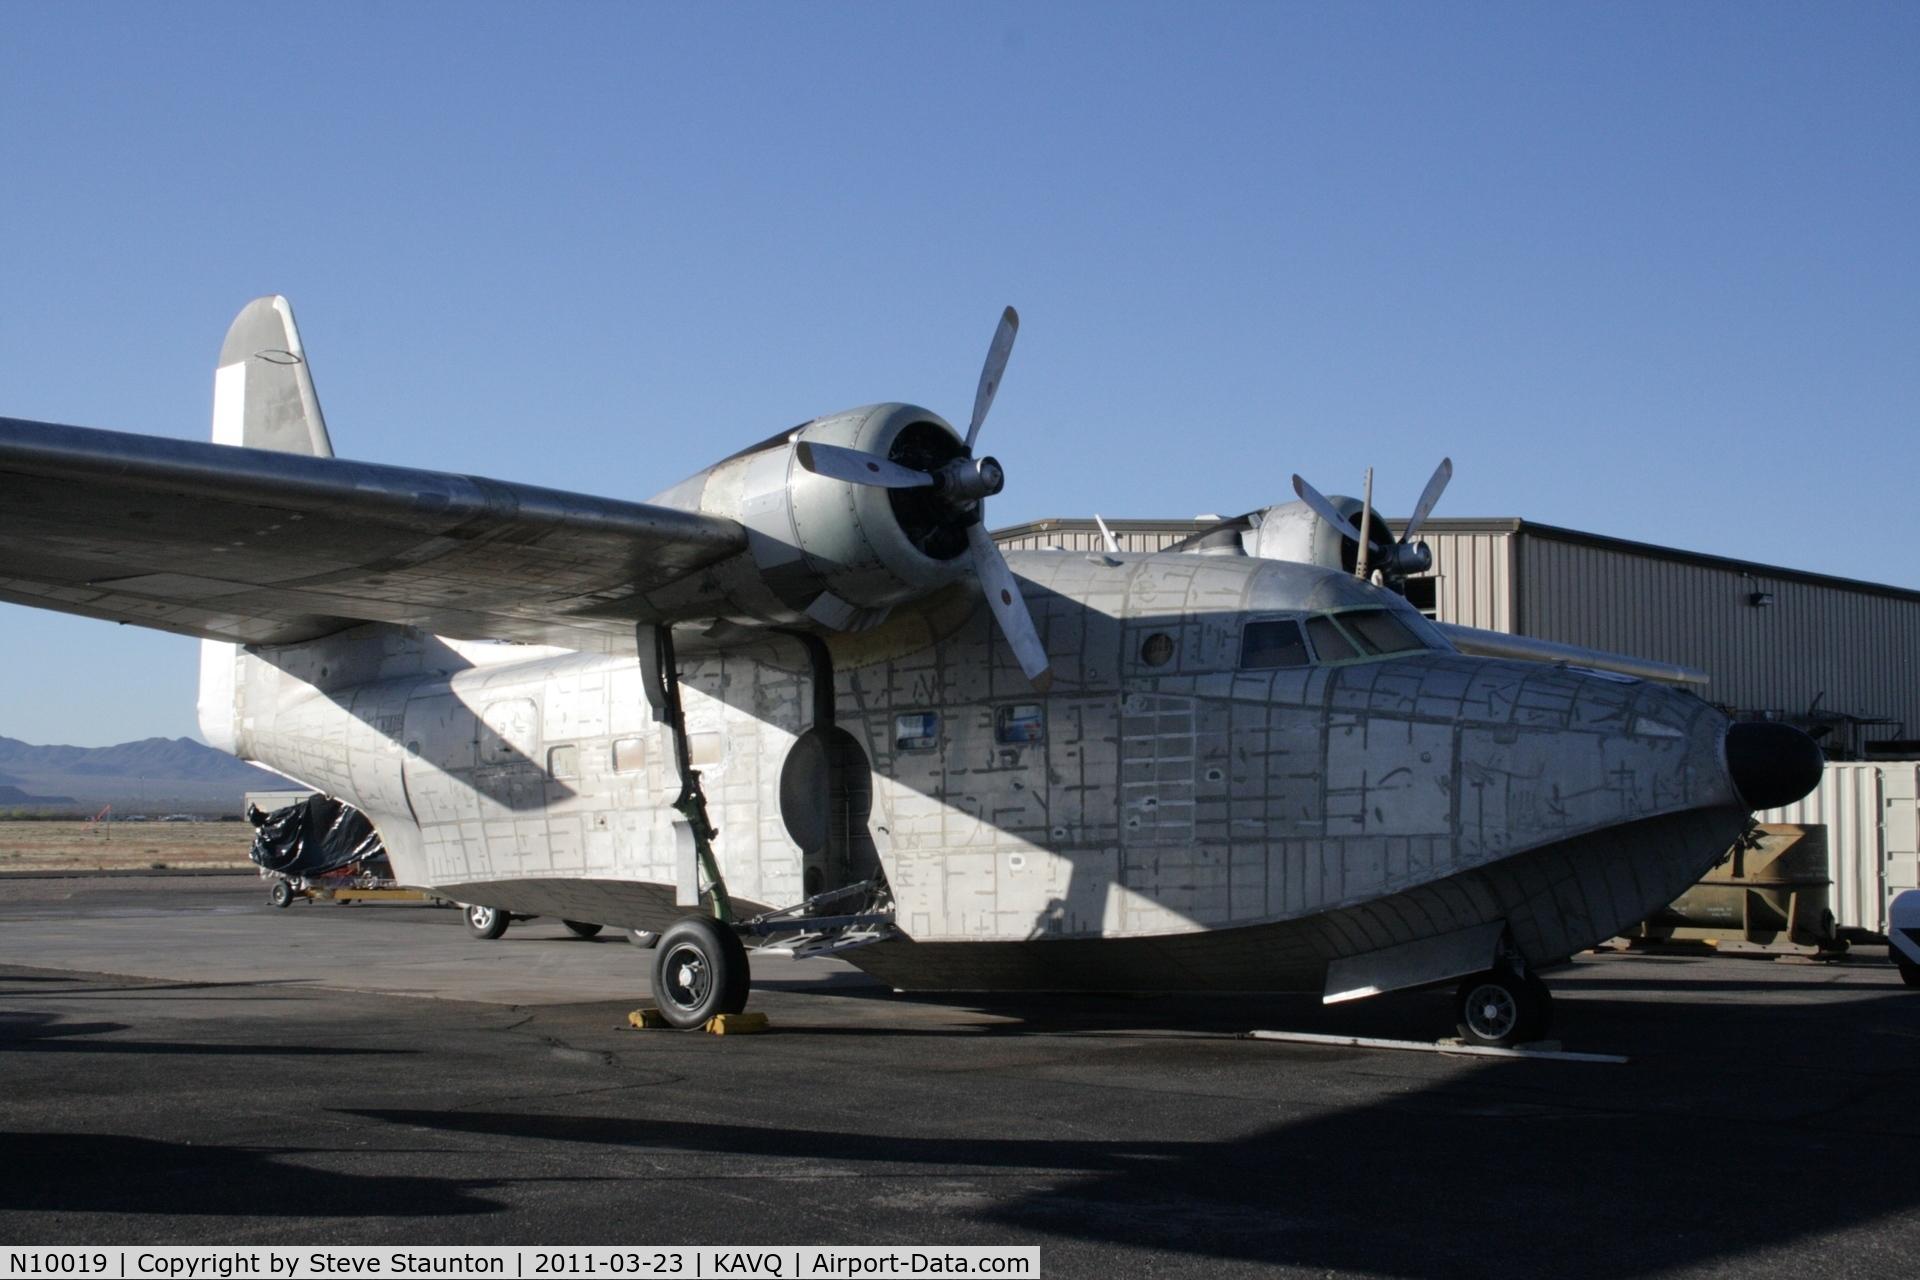 N10019, 1951 Grumman HU-16E Albatross C/N G 92/40B, Taken at Avra Valley Airport, in March 2011 whilst on an Aeroprint Aviation tour